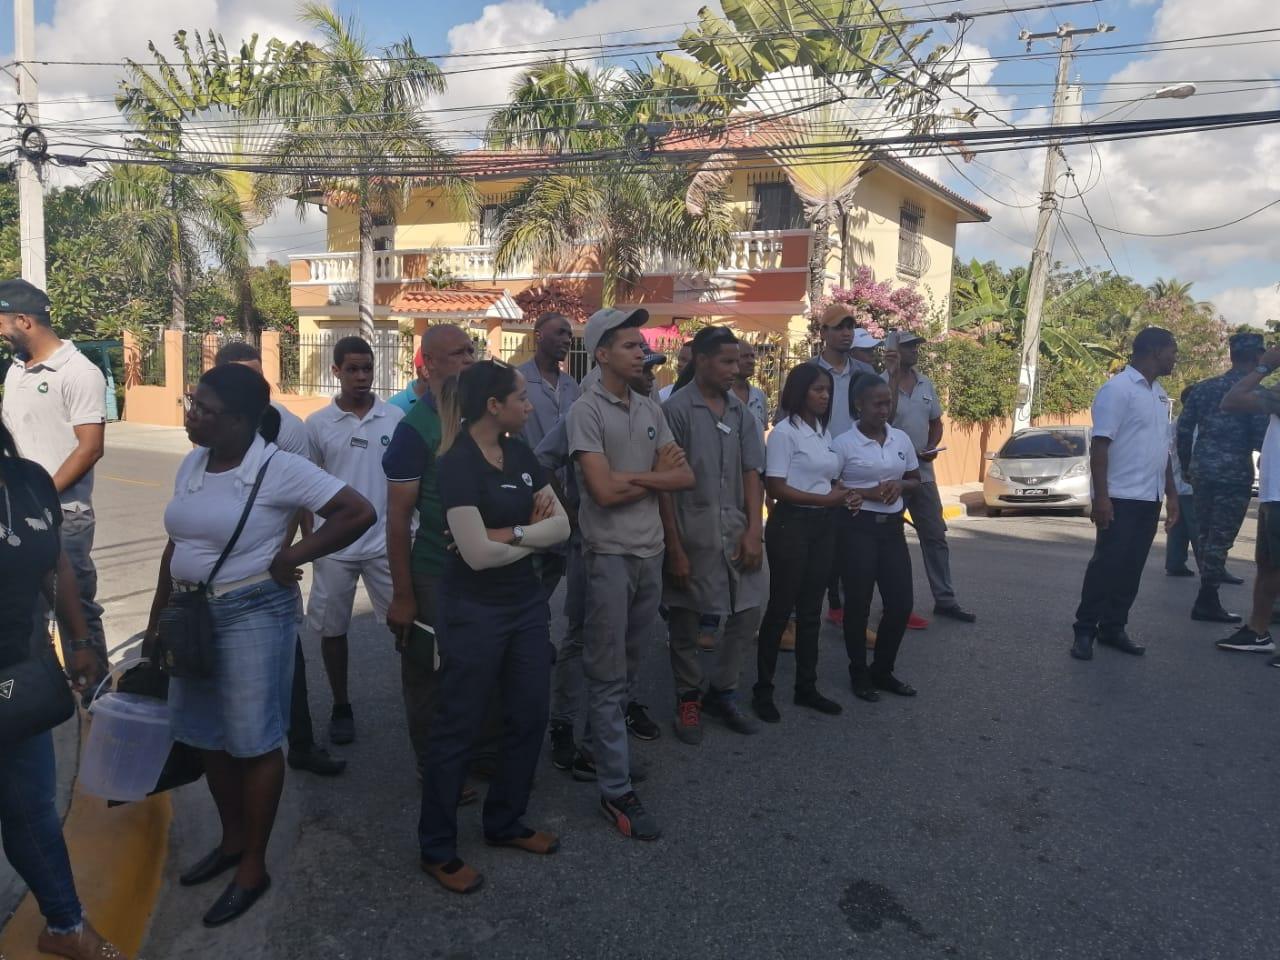 Clúster turístico Boca Chica se manifiesta contra EDEESTE por largas horas de apagones